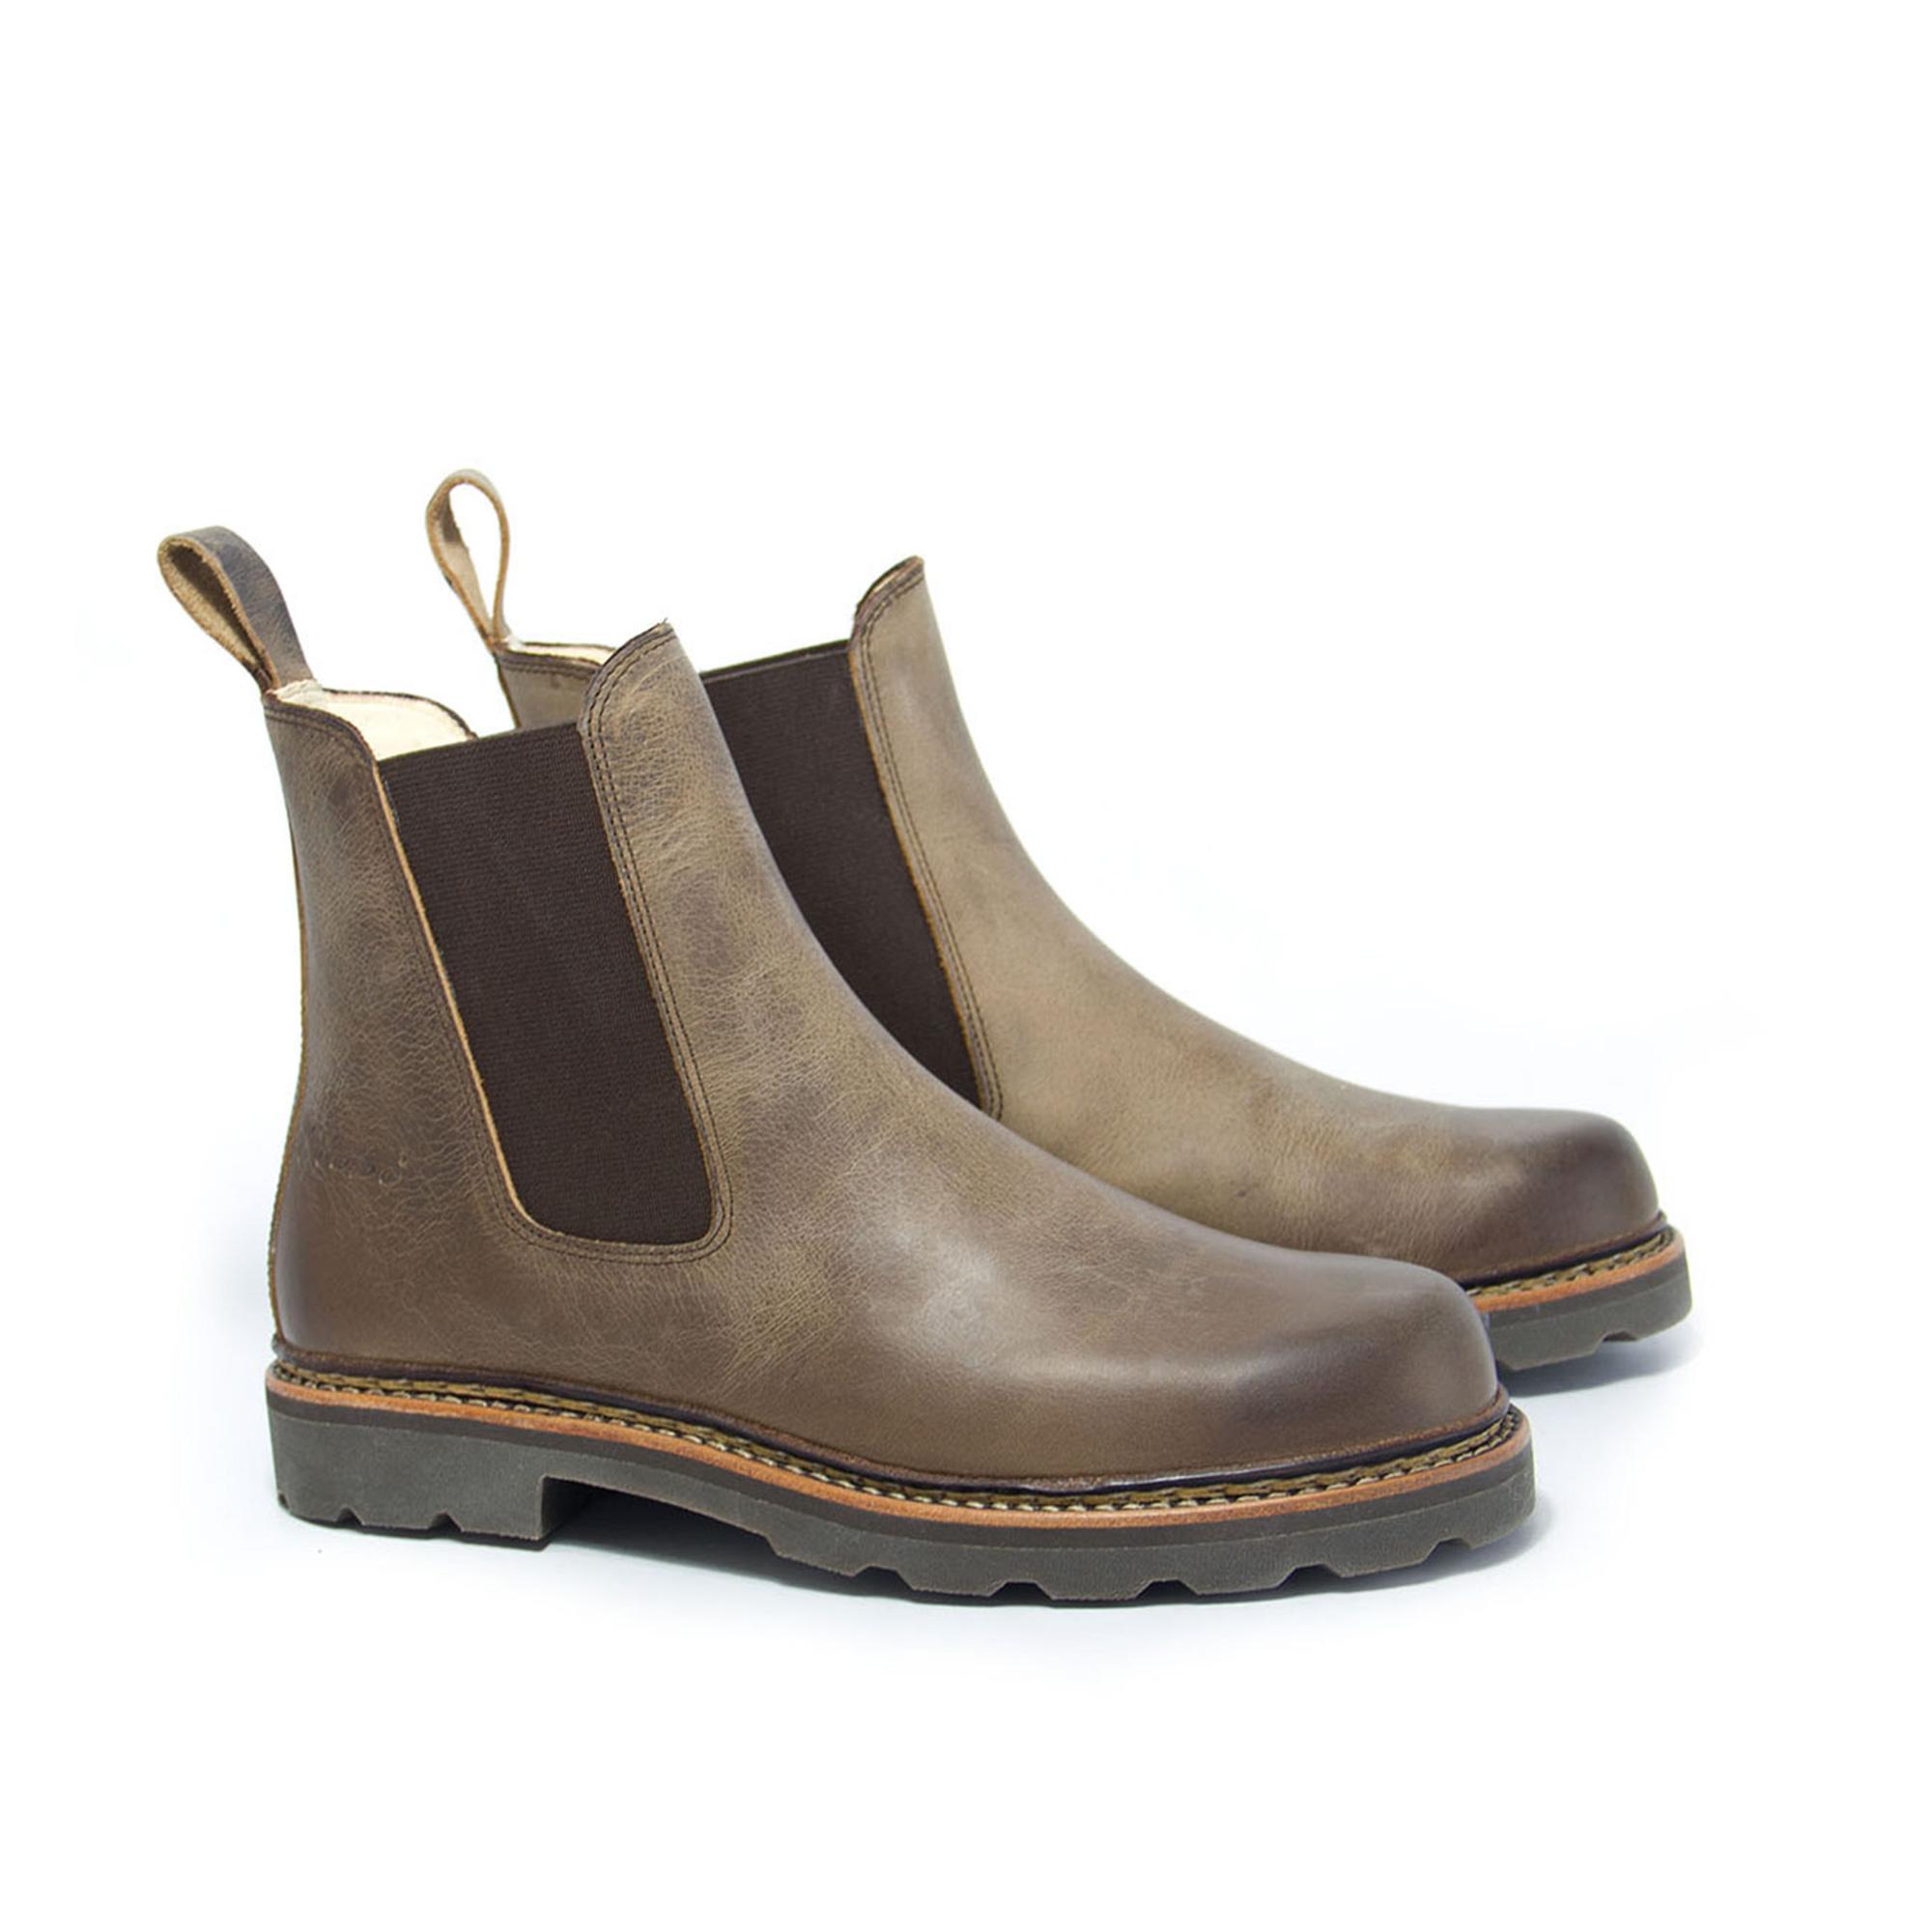 HOBO DAMEN SCHUHE Chelsea Boots Stiefel Gr. 39 Leder